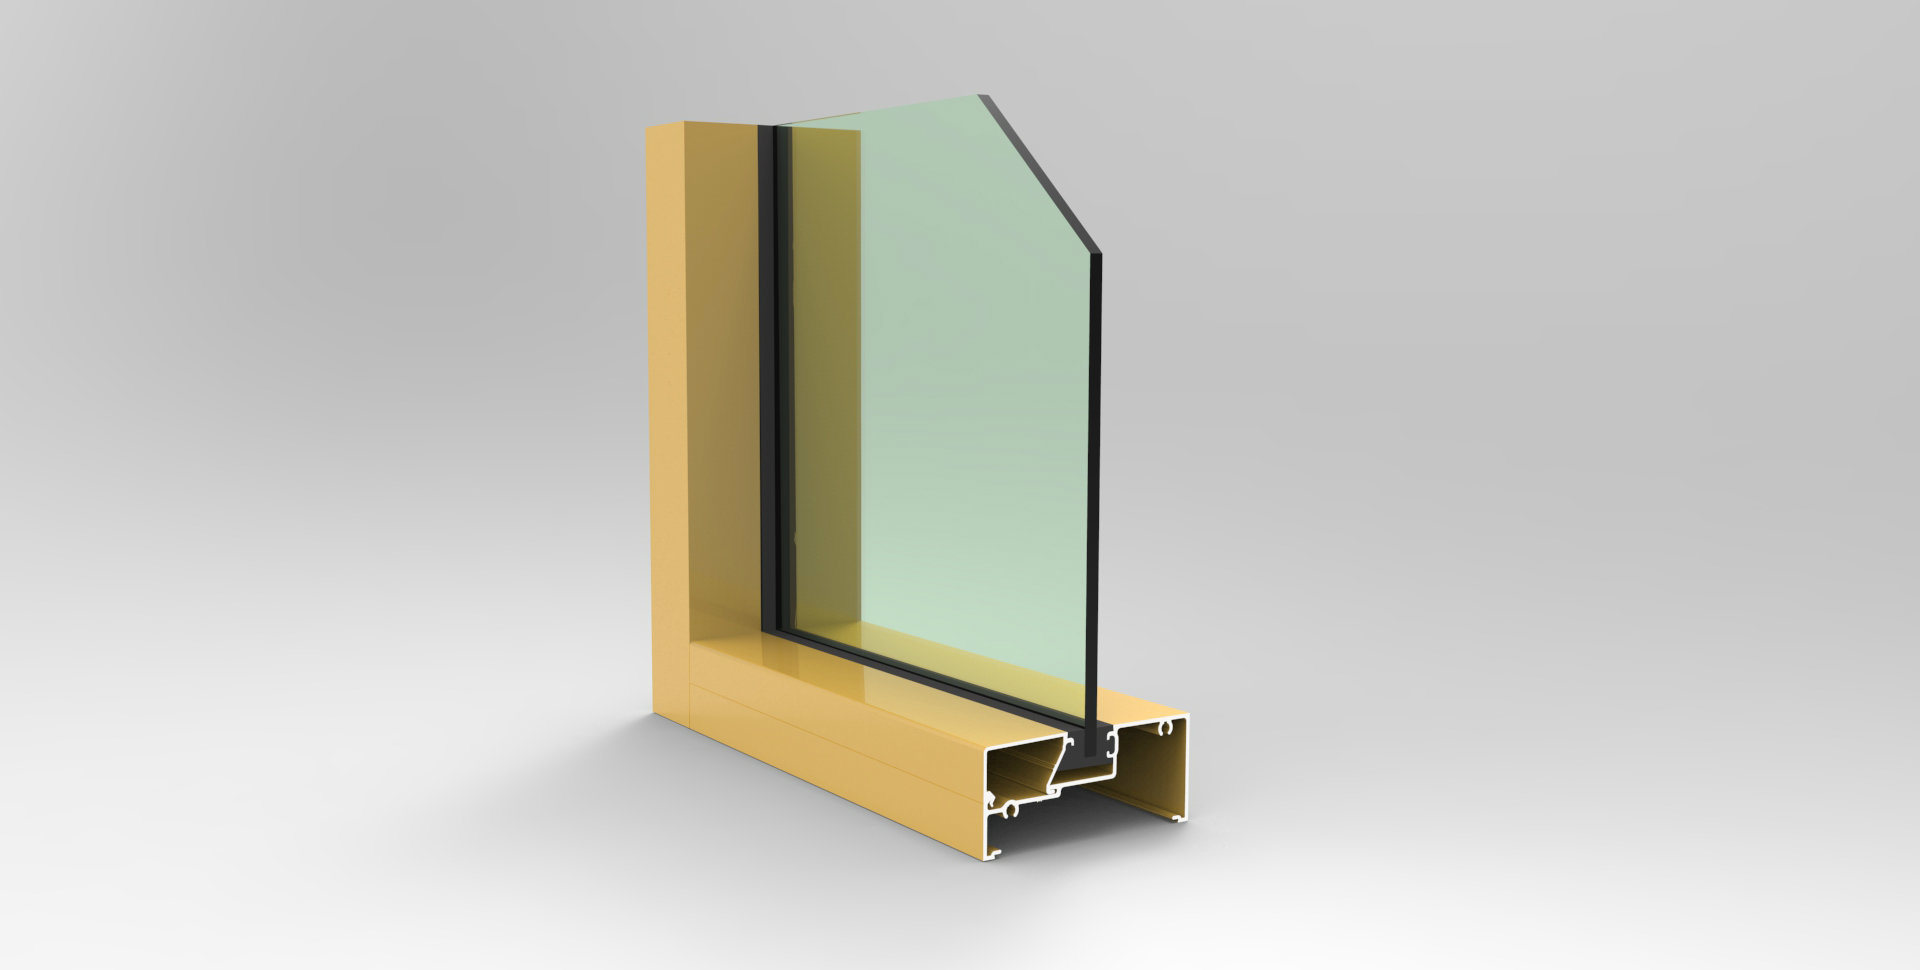 OEM Aluminium Extrusion Profile for Windows, Doors and Curtain Walls